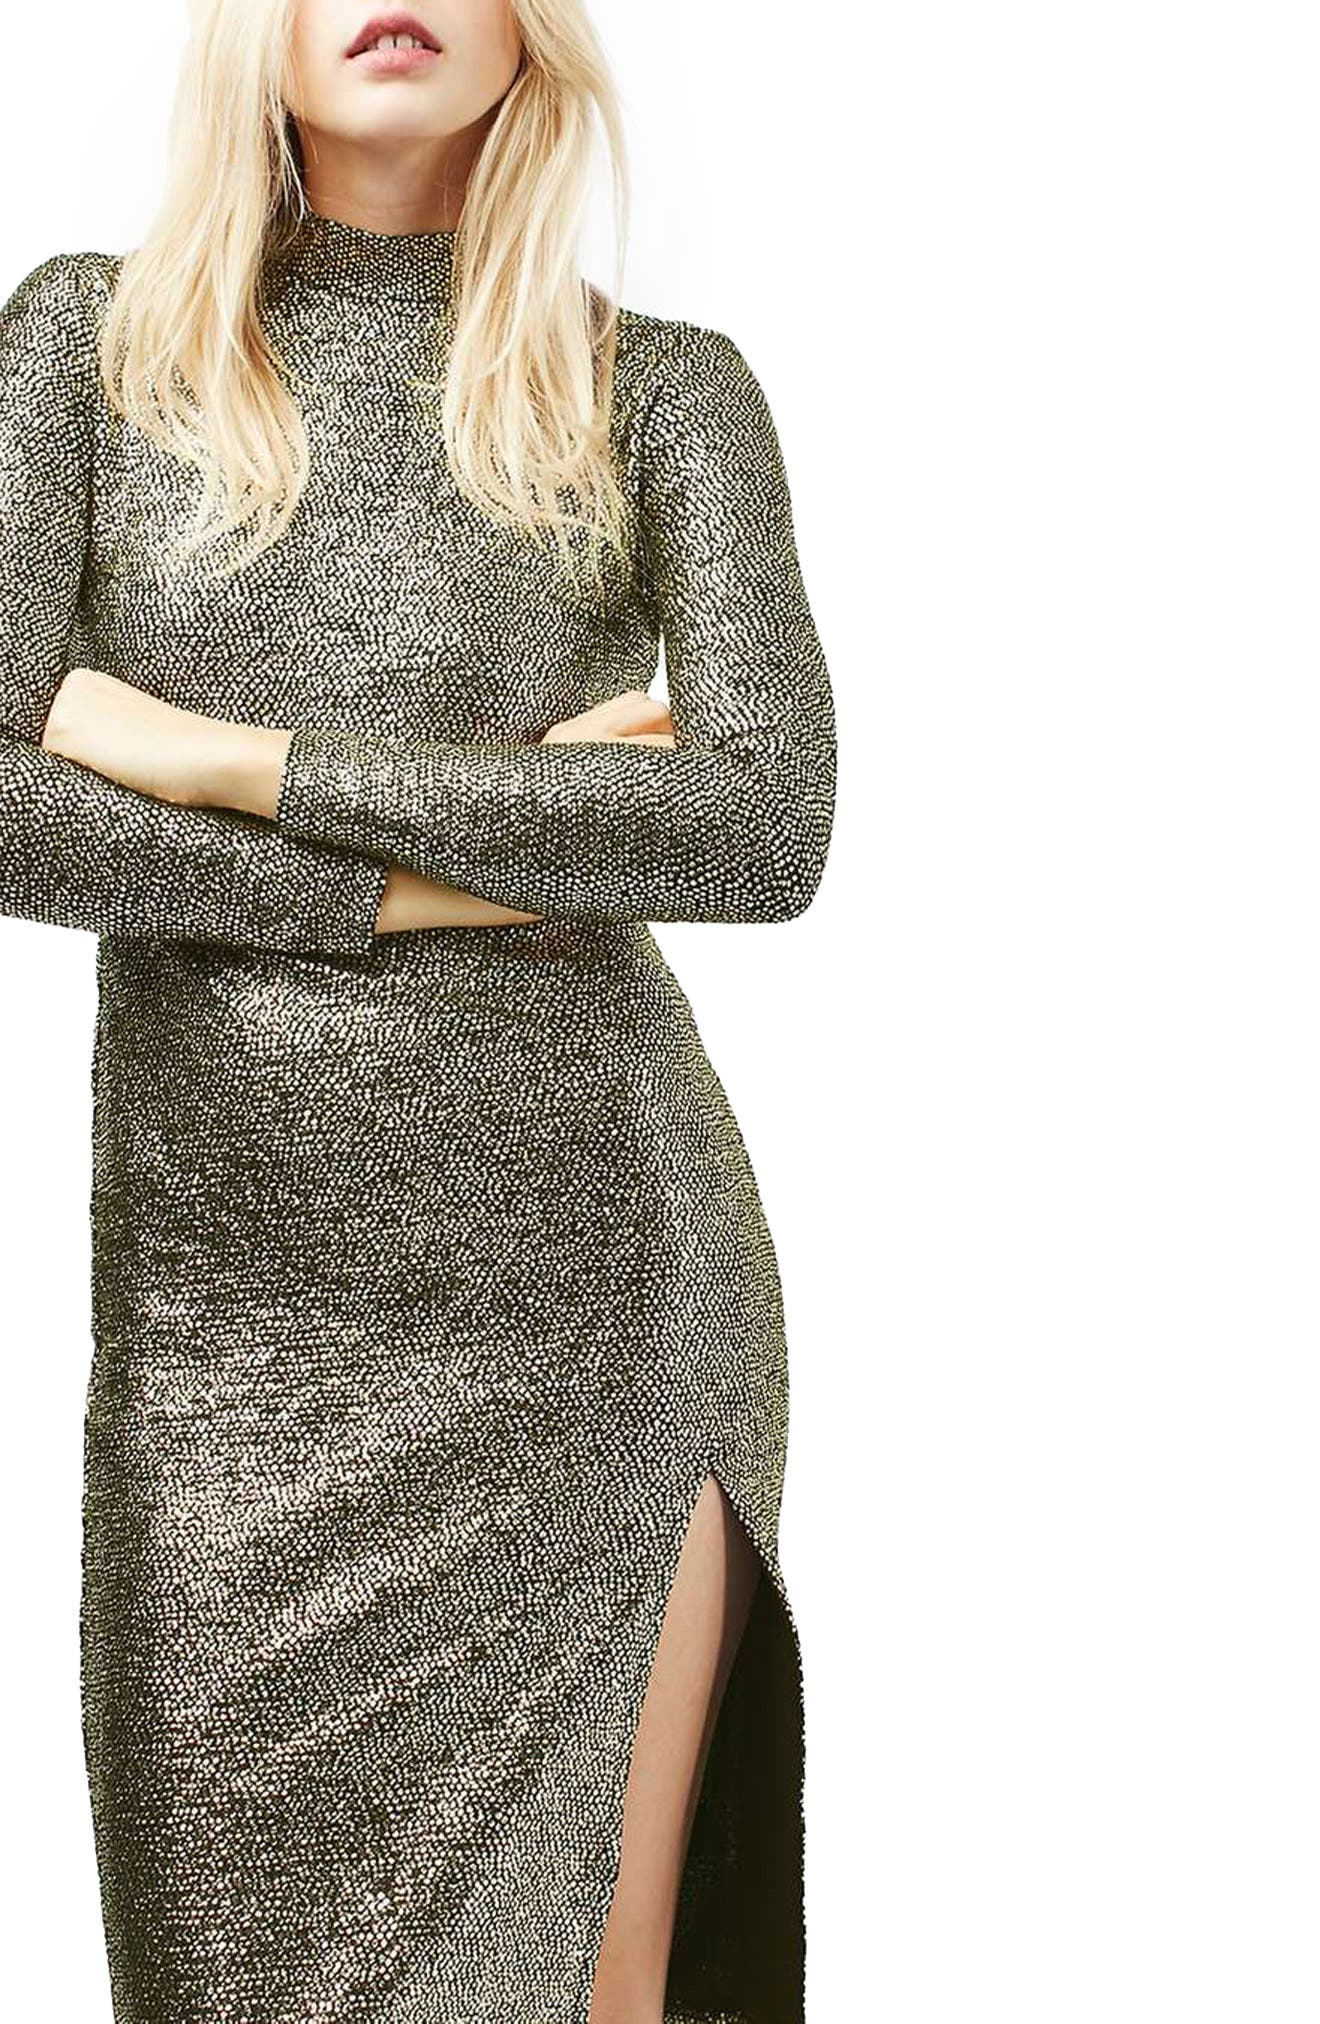 TOPSHOP, Foil Spot Midi Dress, Main thumbnail 1, color, 710